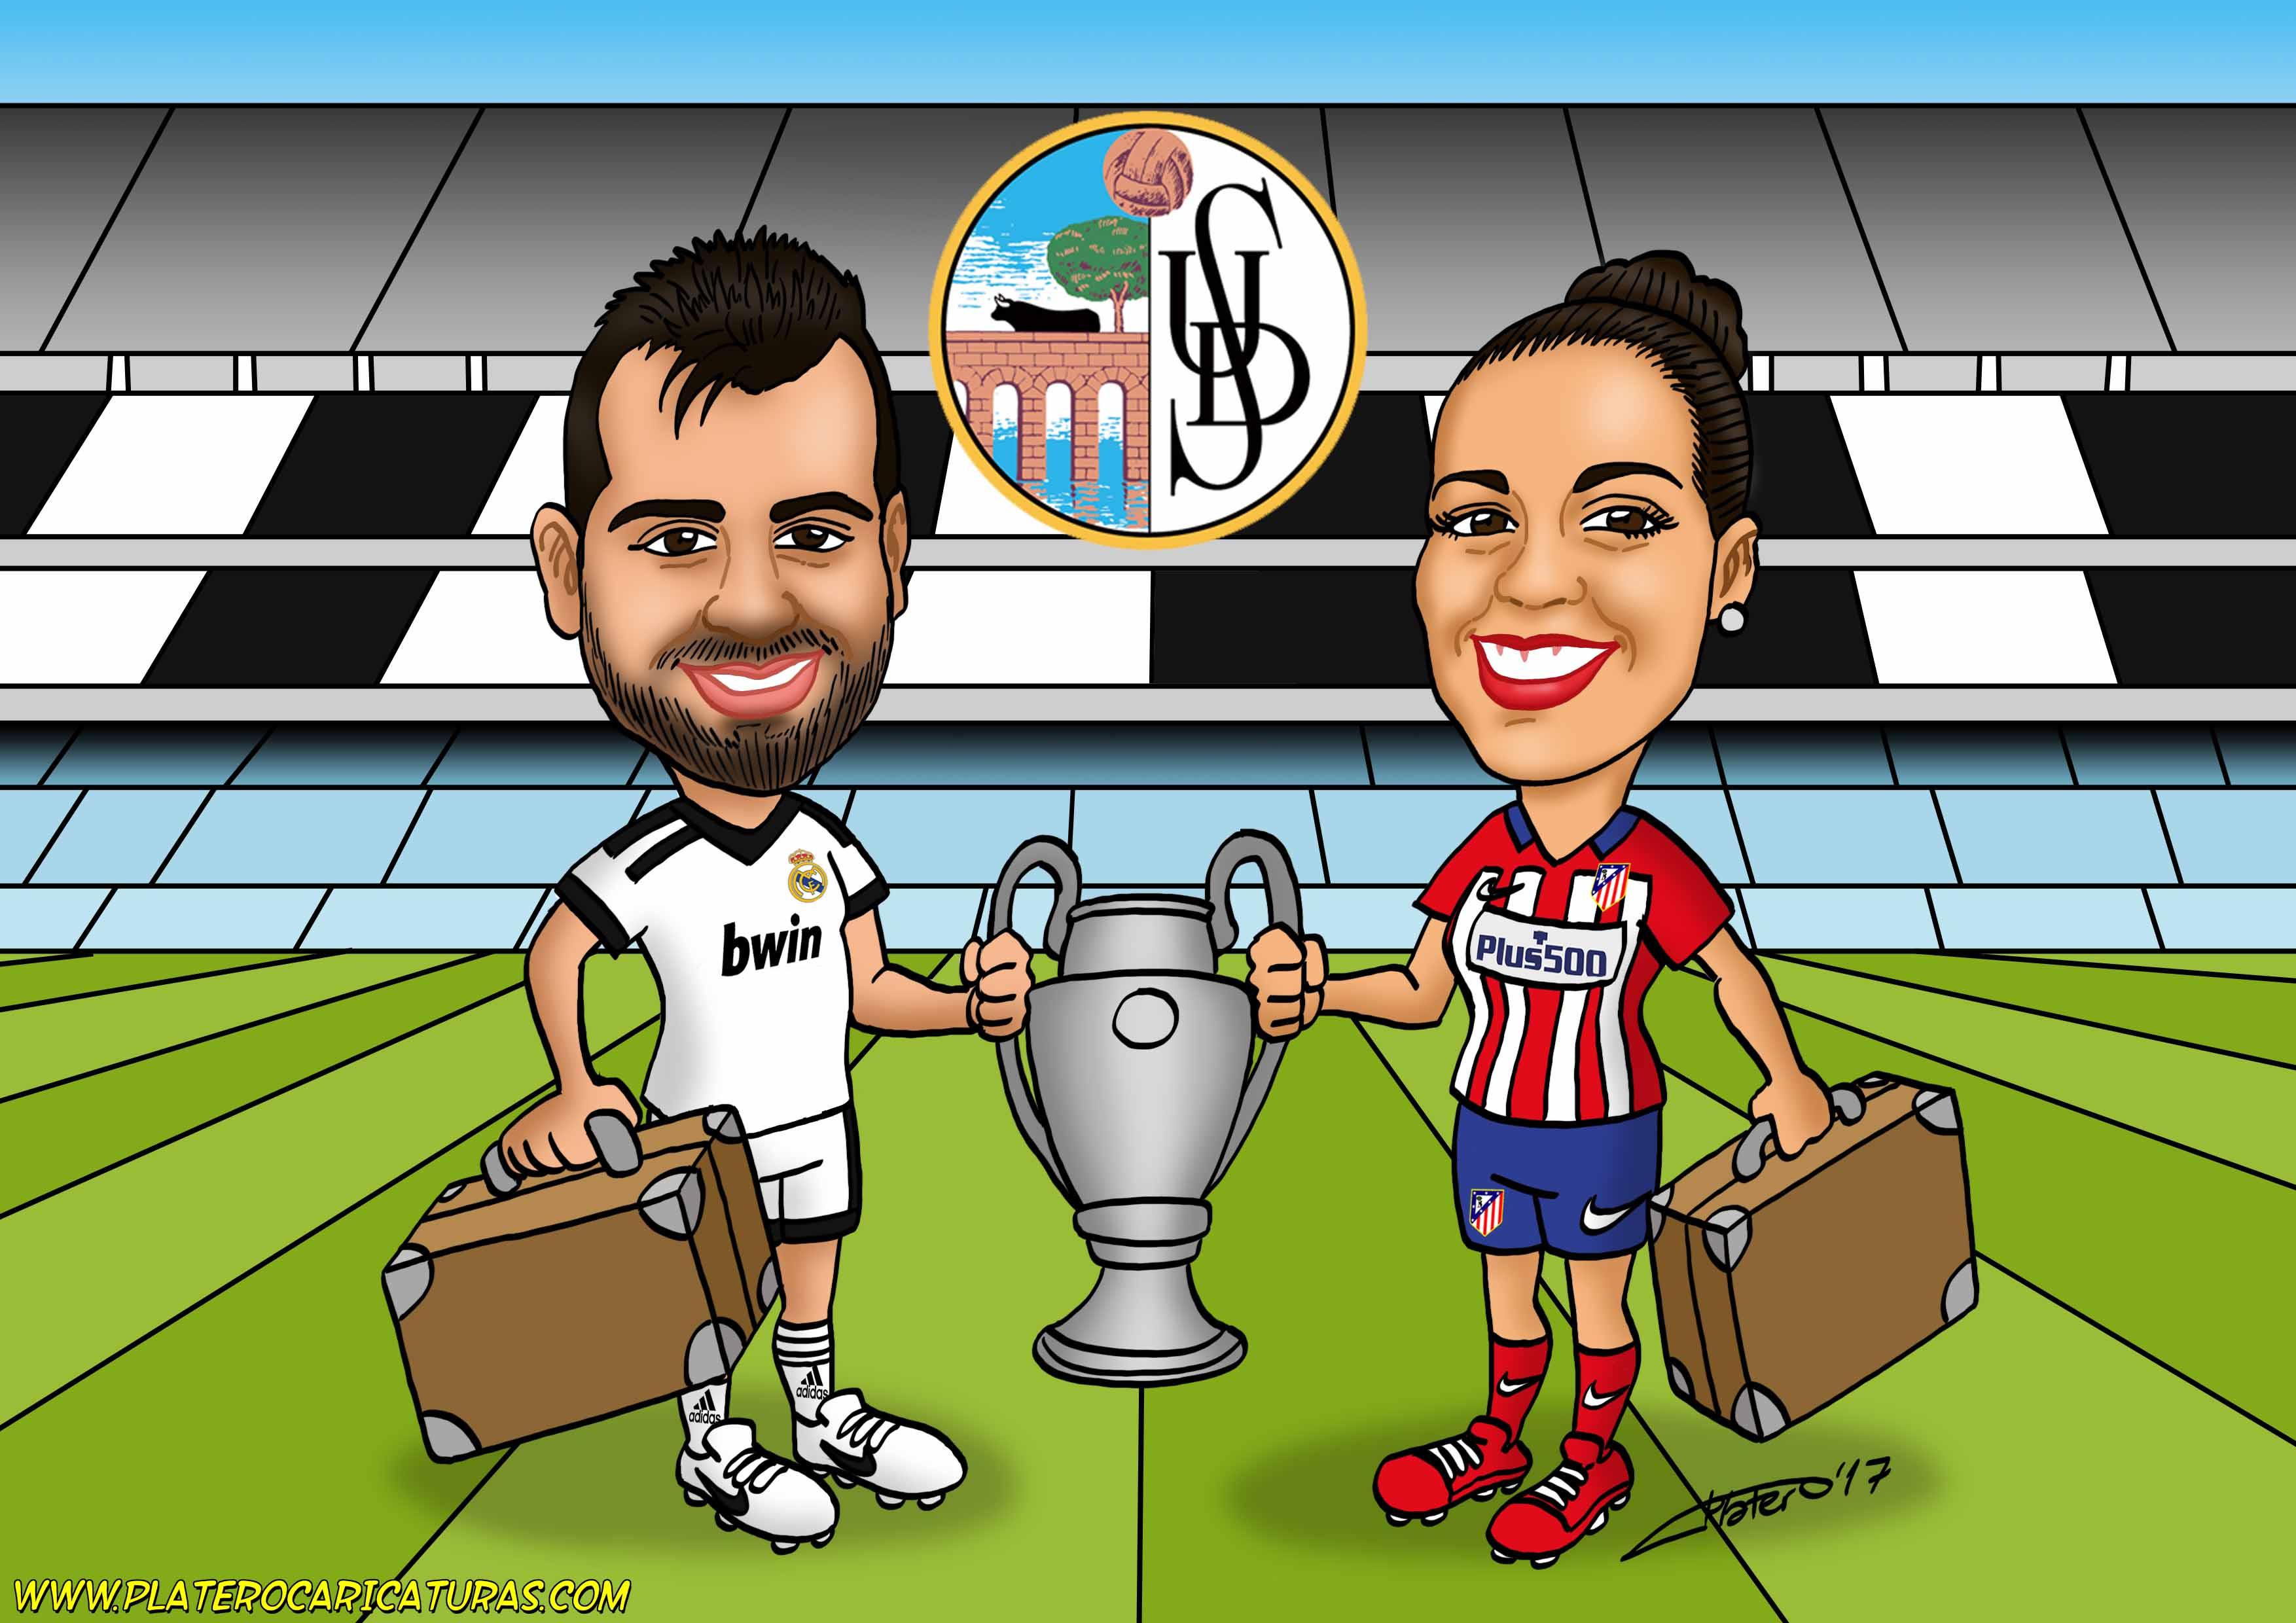 futbolistas con copa_caricatura_caricaturas_platerocaricaturas